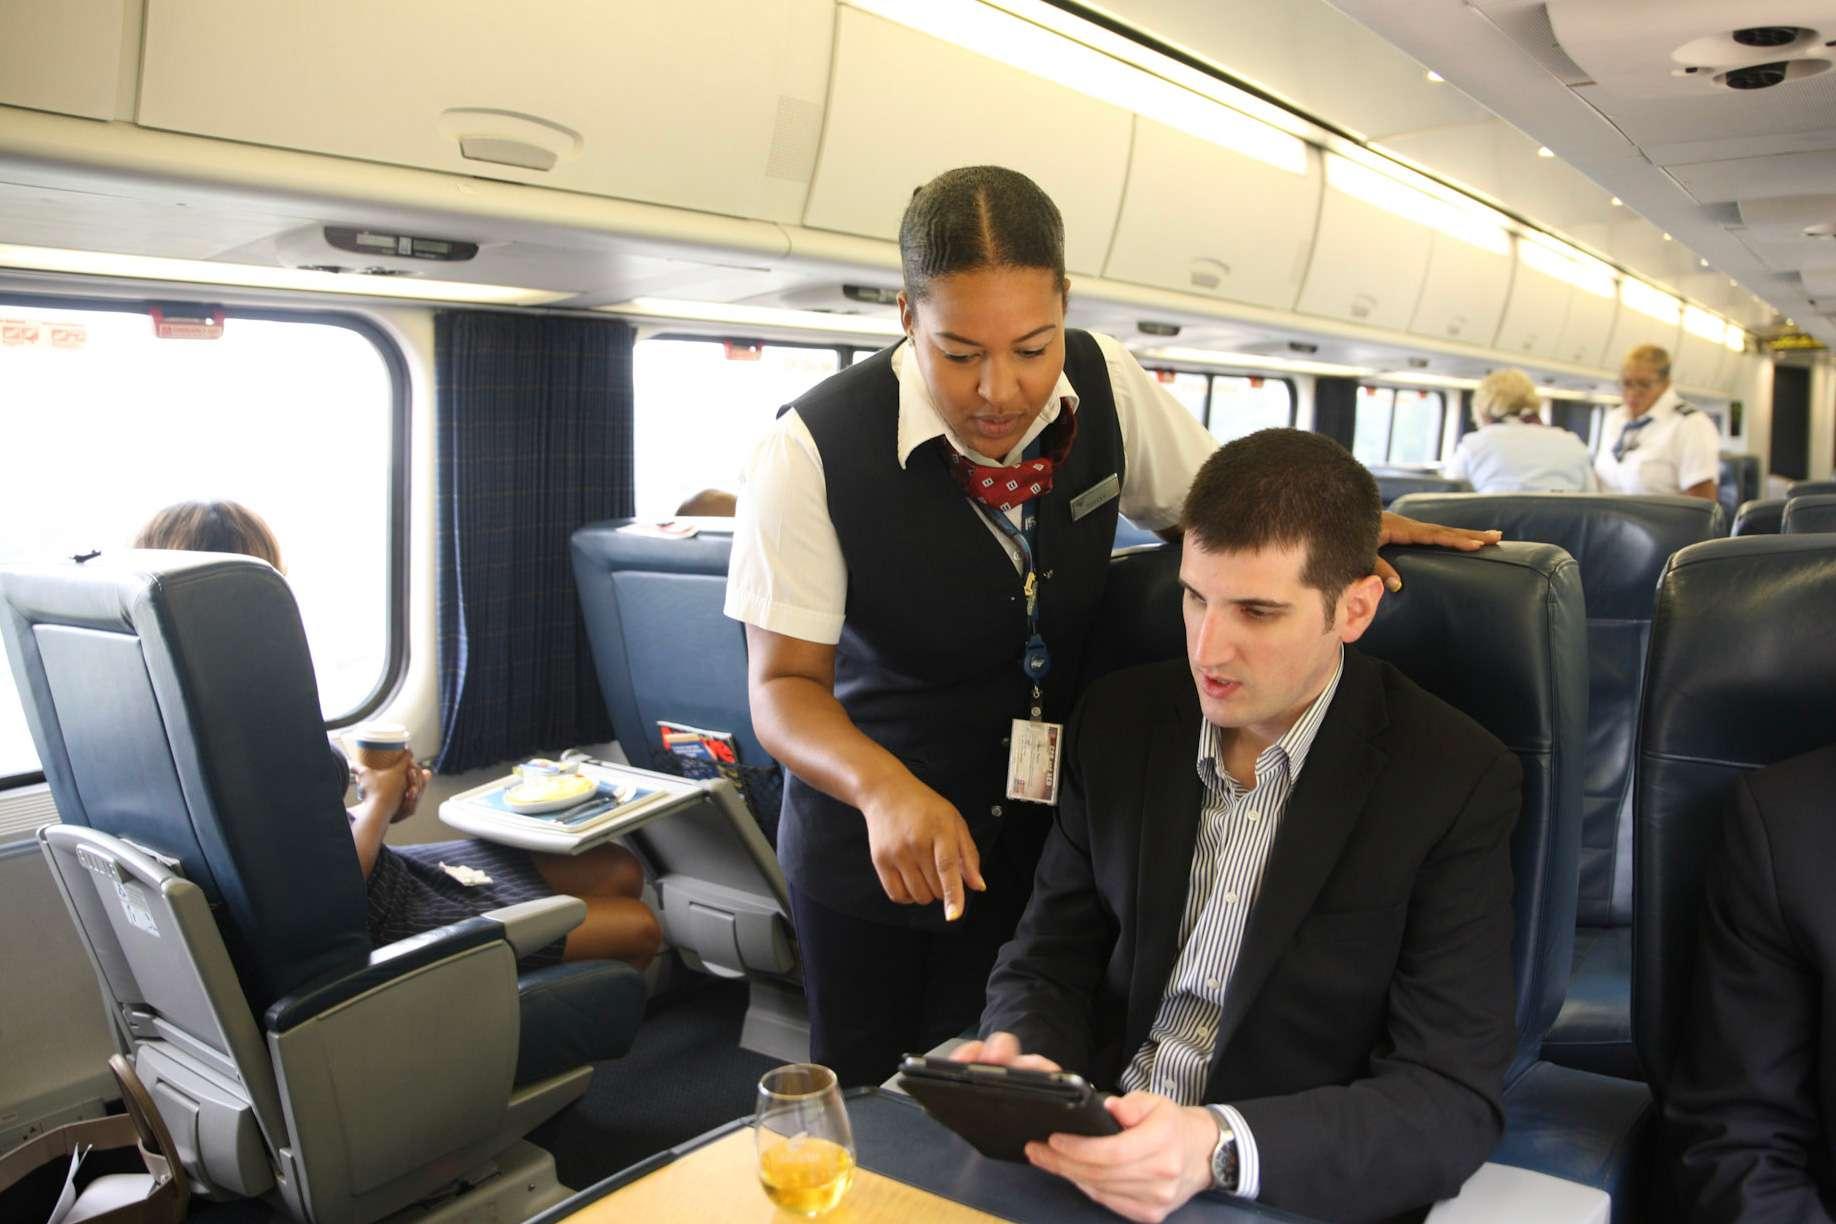 Amtrak employee assisting rider